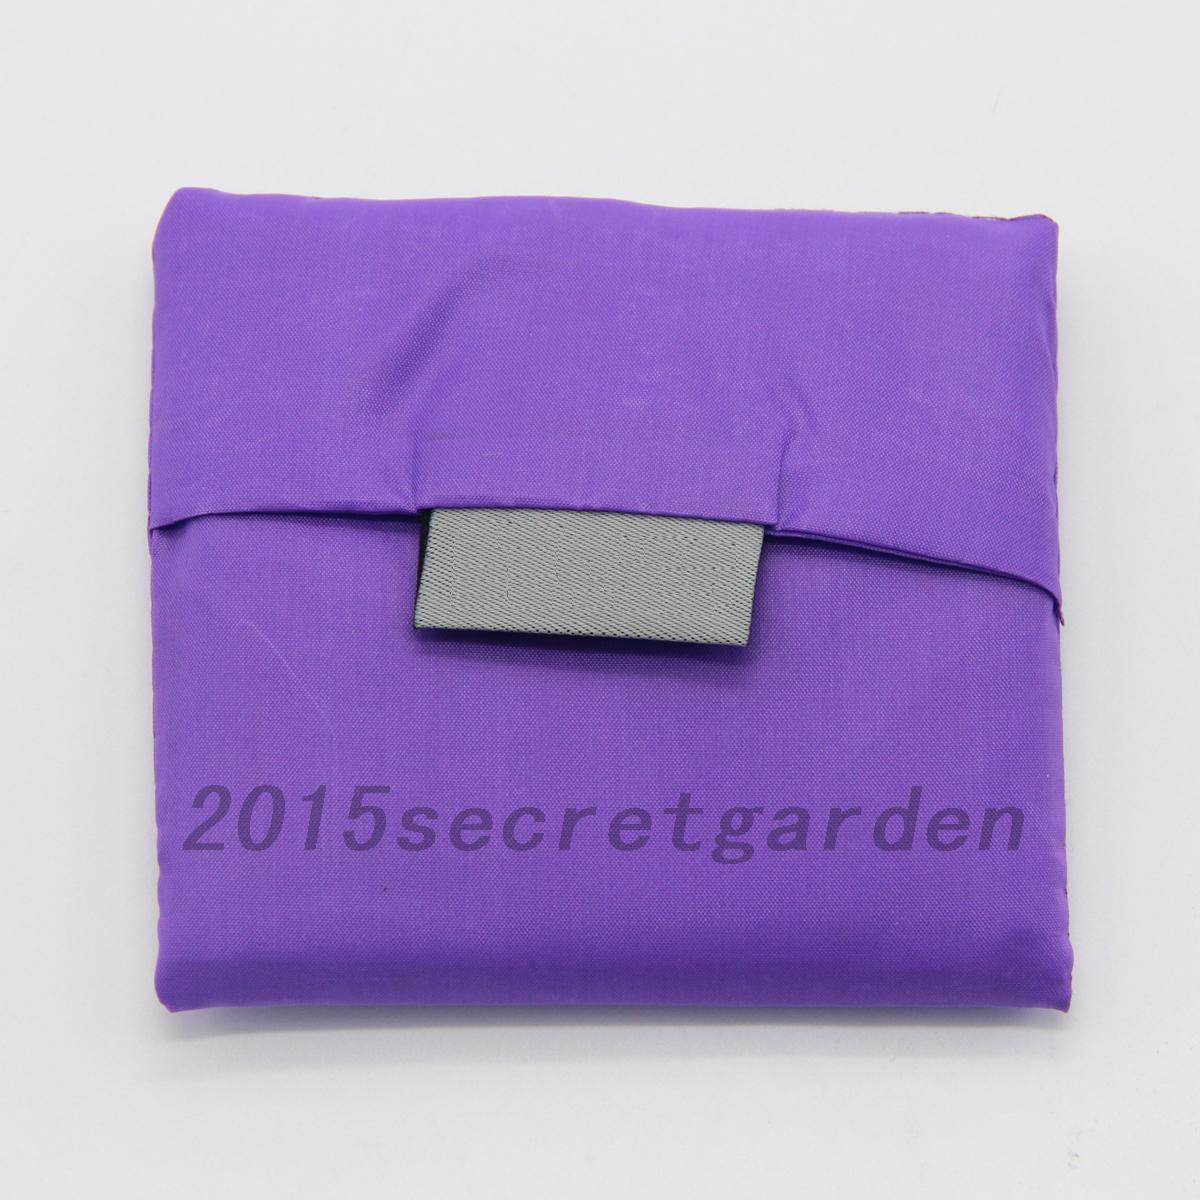 sac pour shopping courses achat cabas polyester pliable pochette poche durable ebay. Black Bedroom Furniture Sets. Home Design Ideas